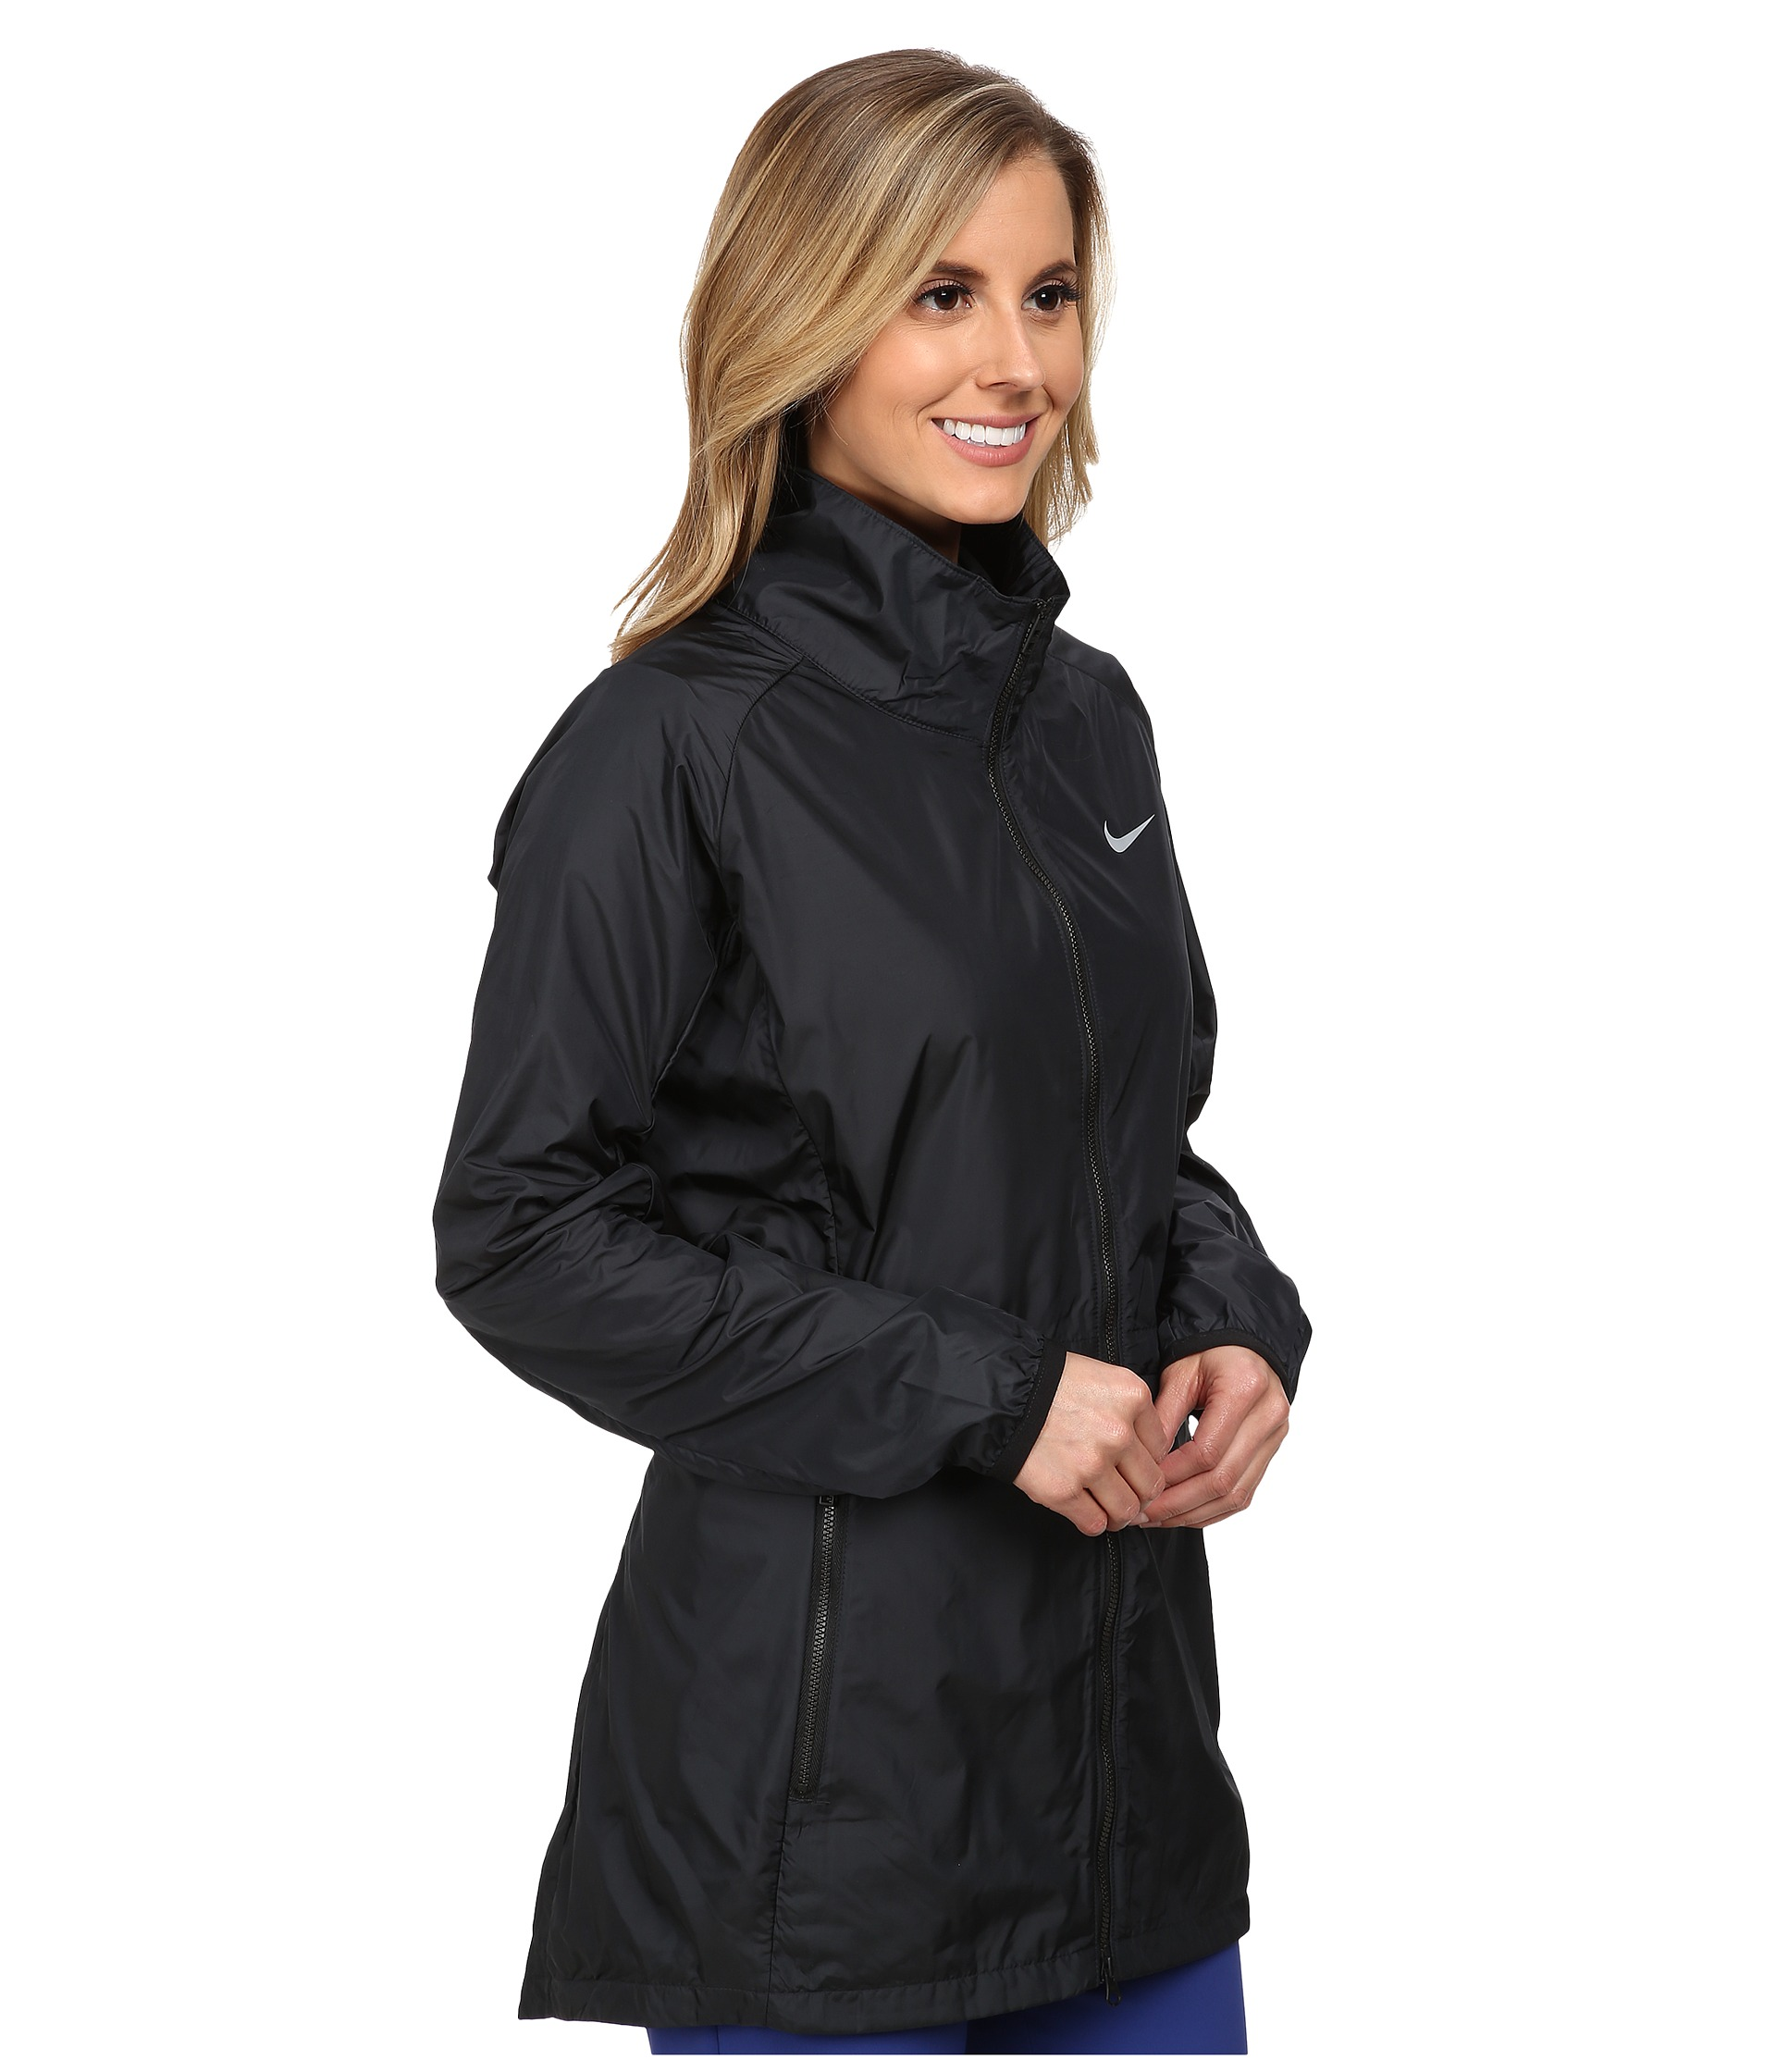 Nike Golf, Coats & Outerwear, Women | Shipped Free at Zappos